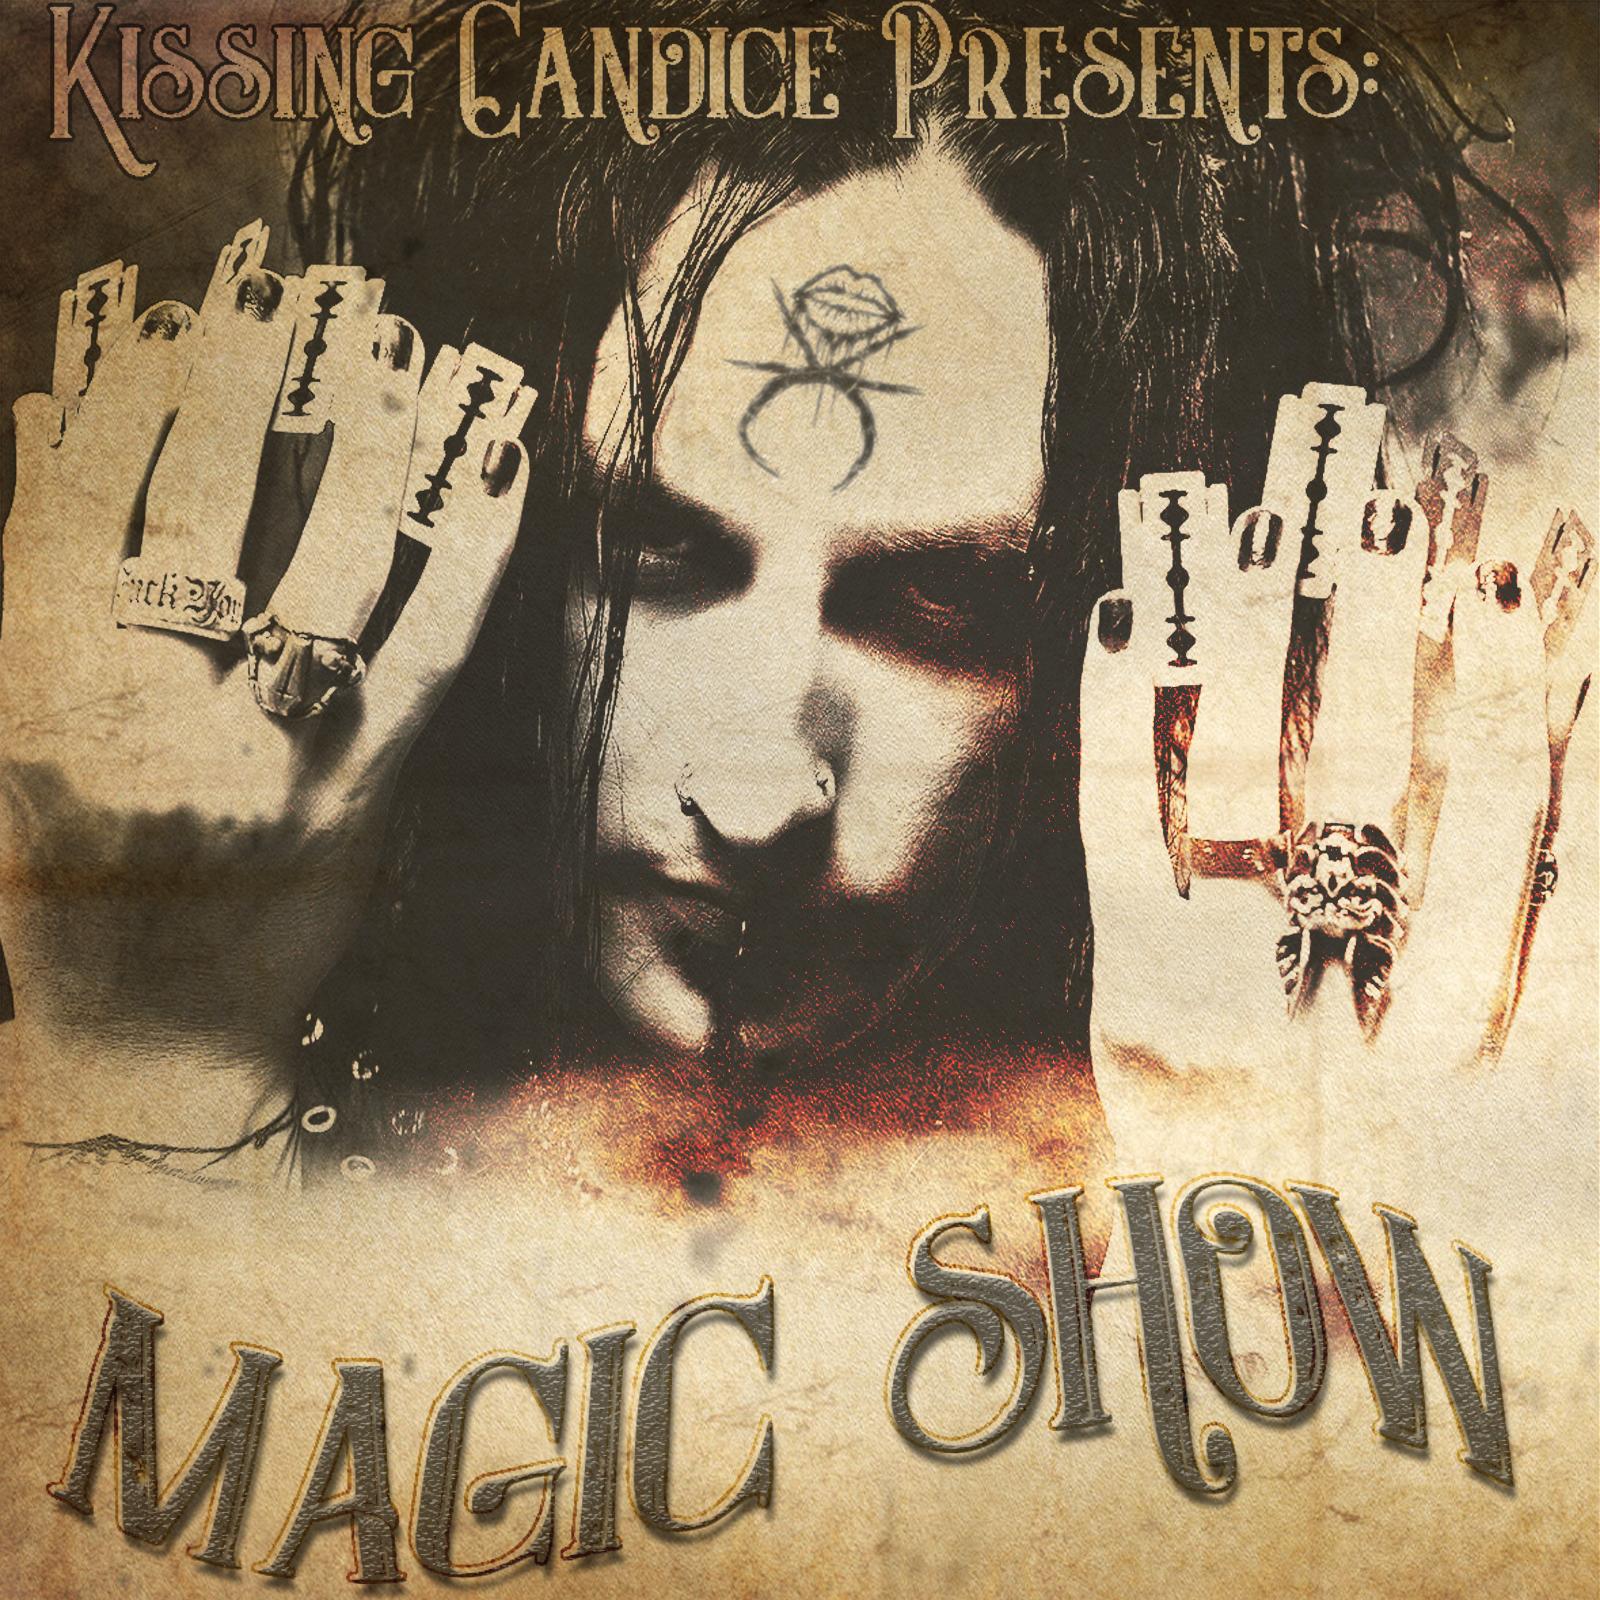 MAGIC SHOW - SINGLE (6/14/2019)   Self-Release